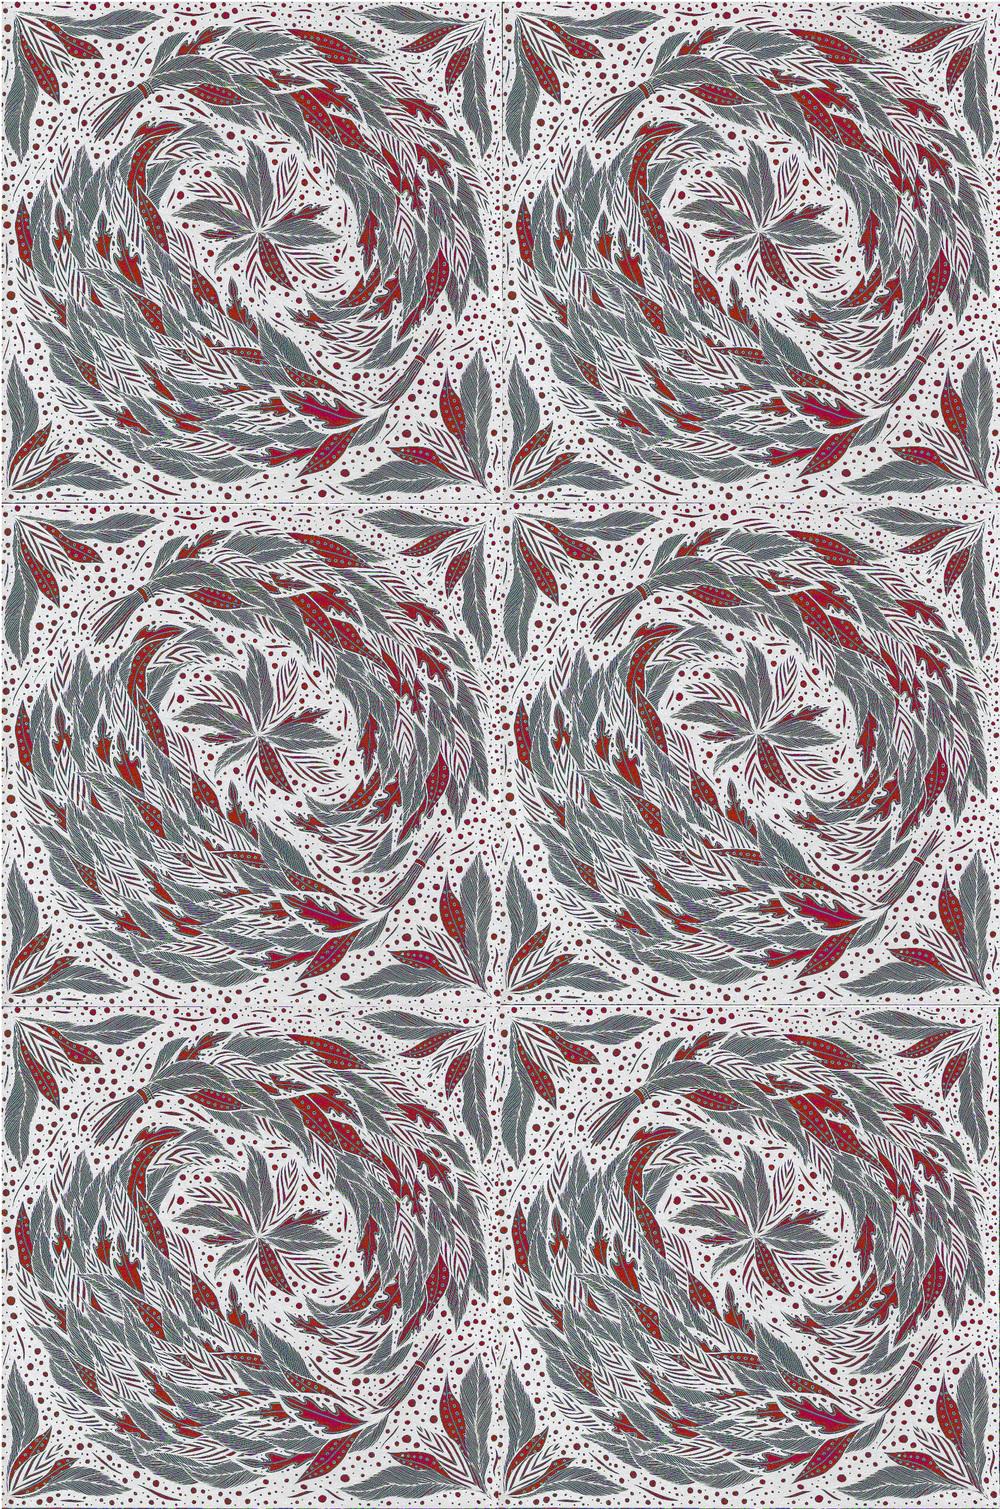 patterns4.jpg